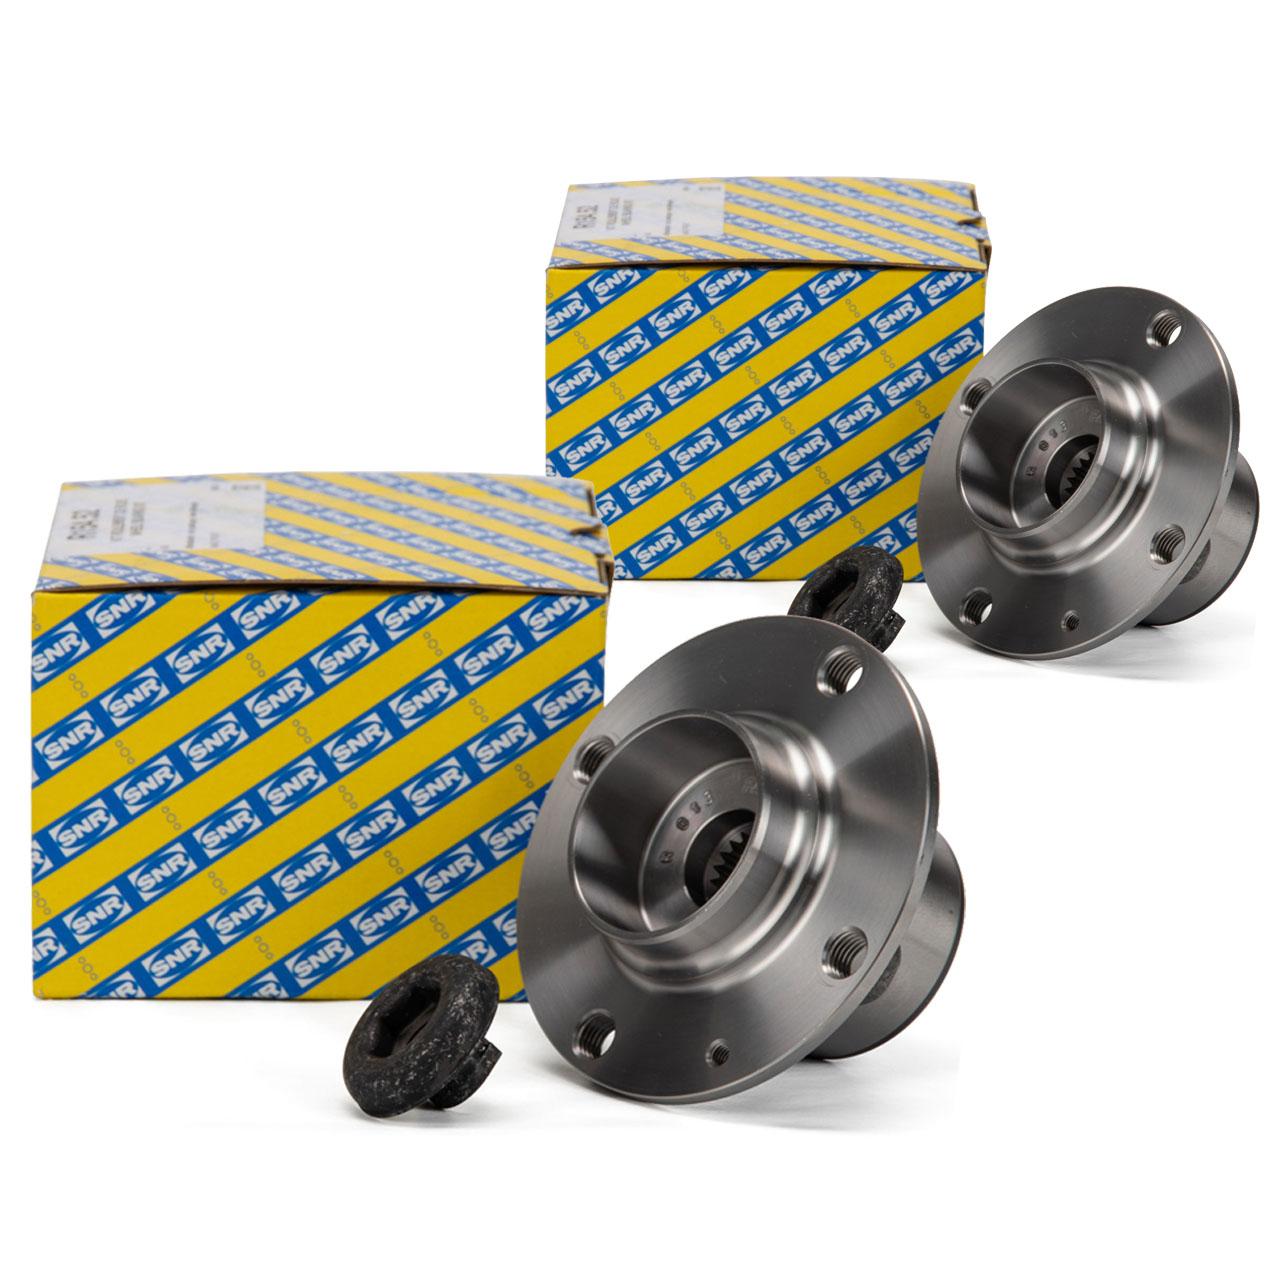 2x SNR R154.52 Radlagersatz AUDI A2 1.2 TDI VW Lupo 1.2 TDI 3L vorne 6E0407621C